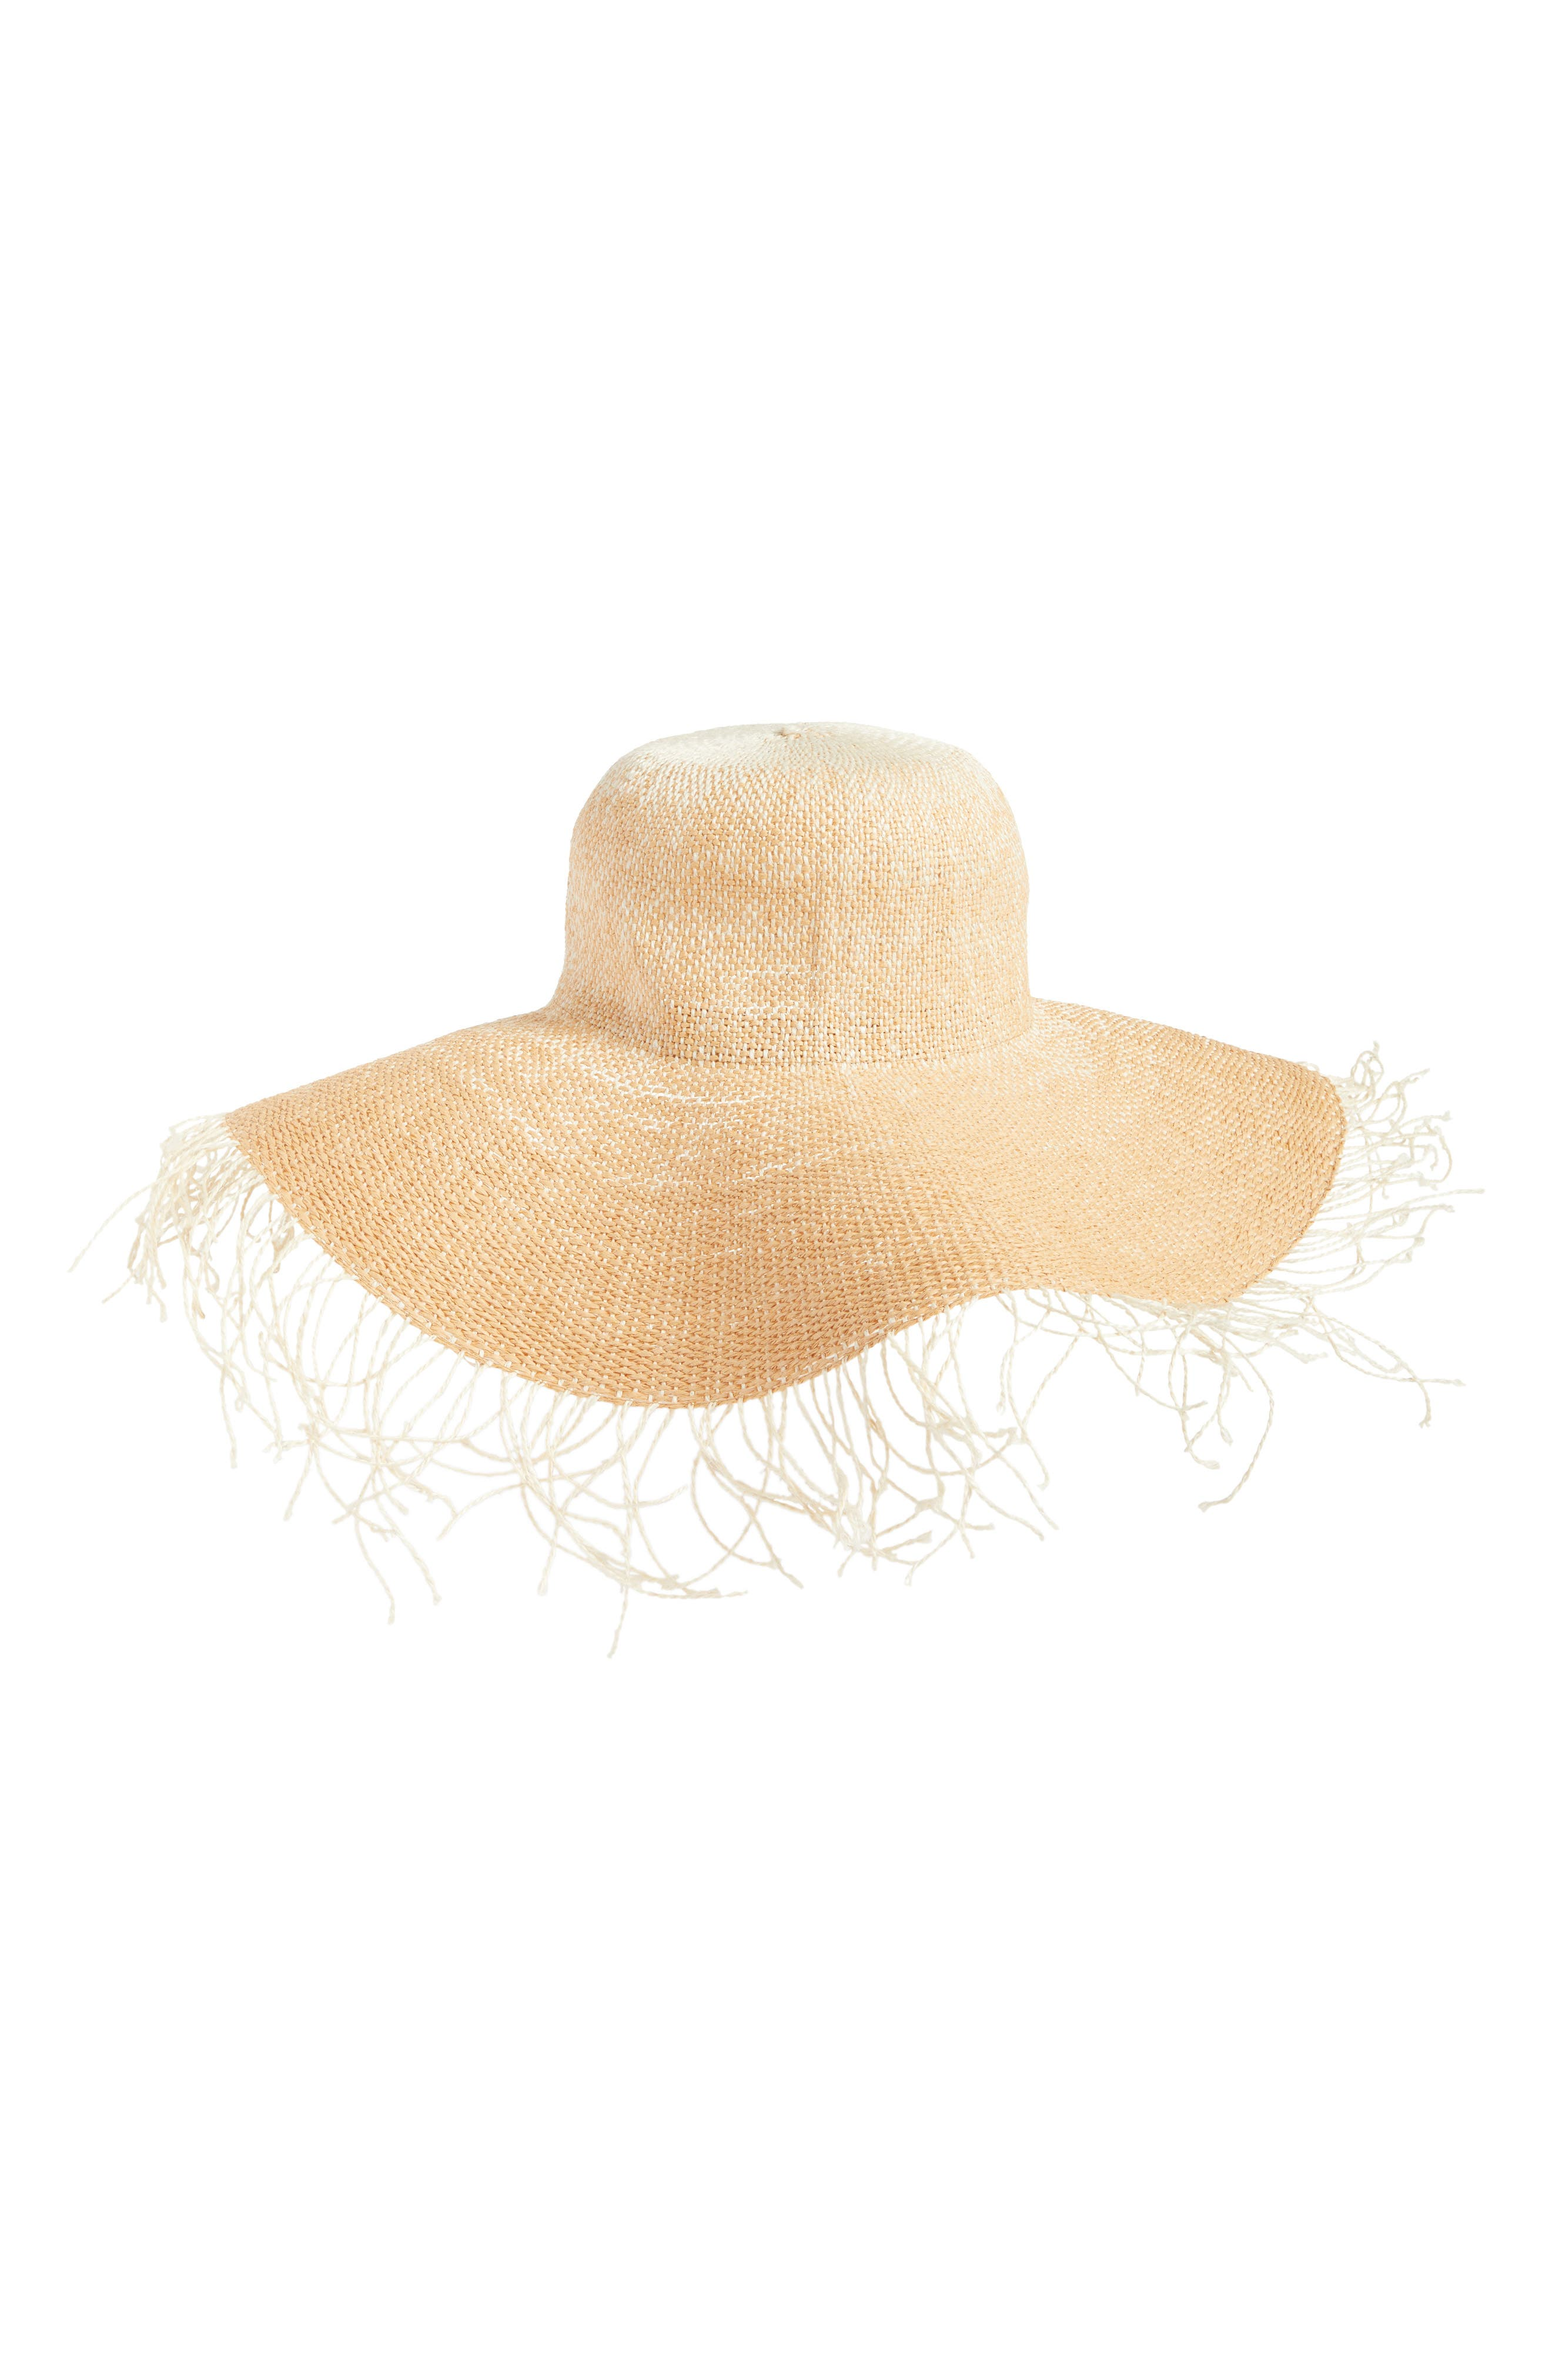 Fringe Ombré Floppy Straw Hat,                         Main,                         color, Natural/ White